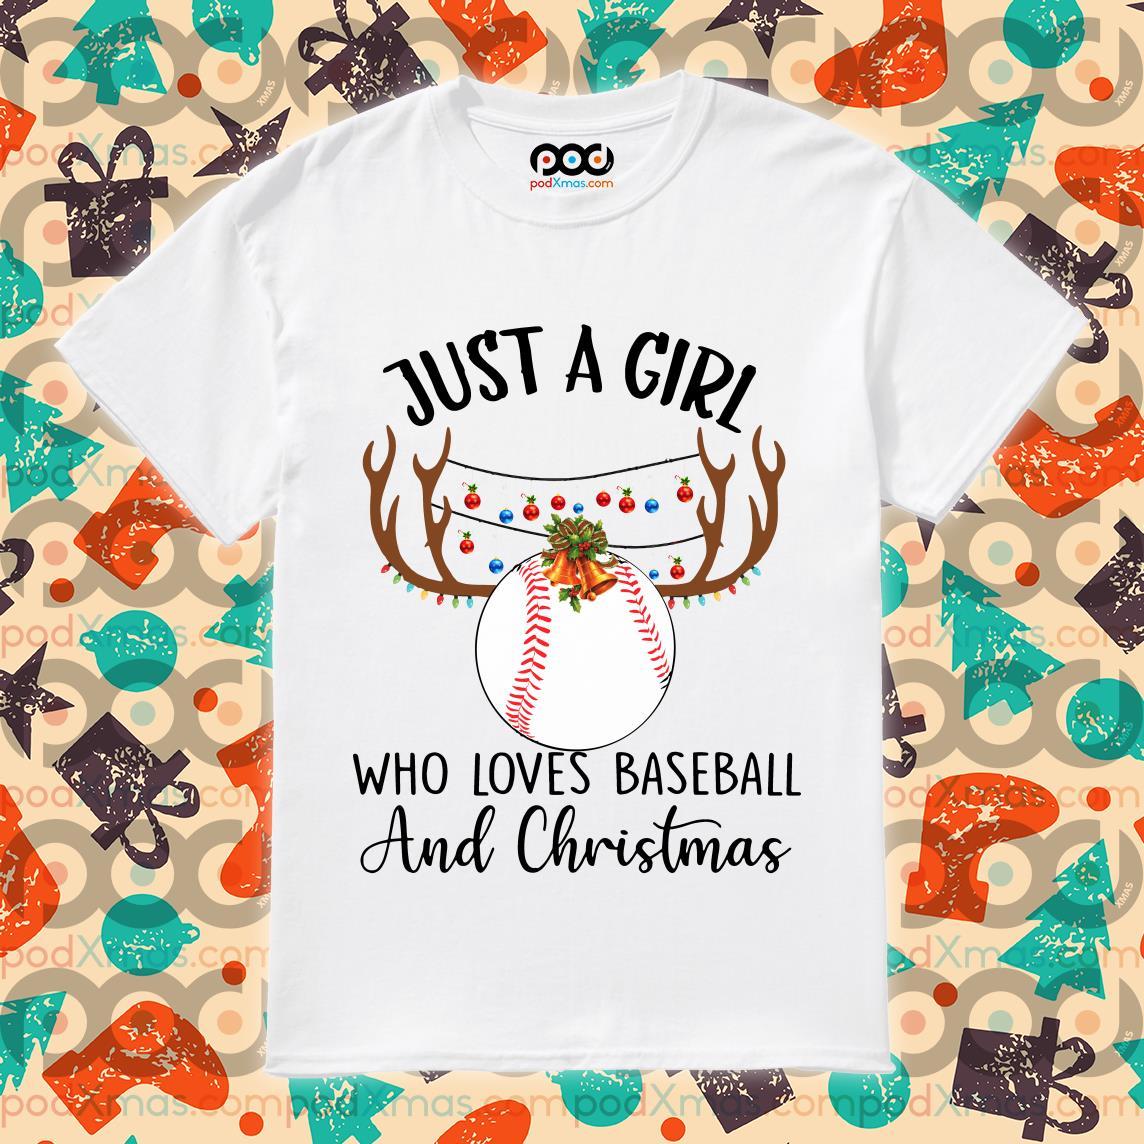 Just a girl who loves baseball and Christmas shirt